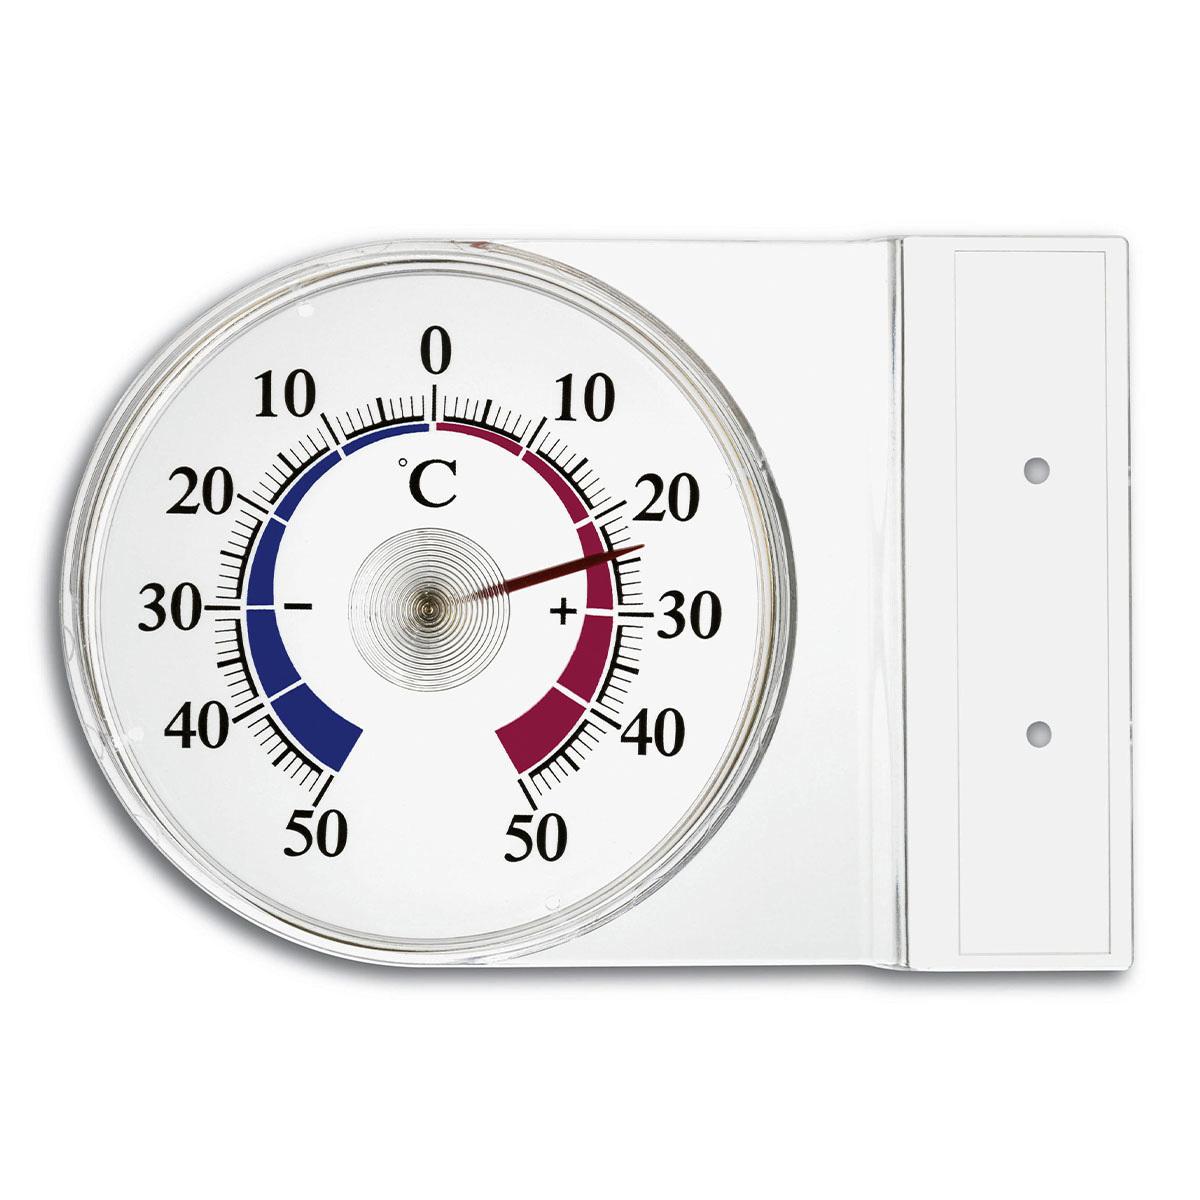 14-6003-analoges-fensterthermometer-1200x1200px.jpg